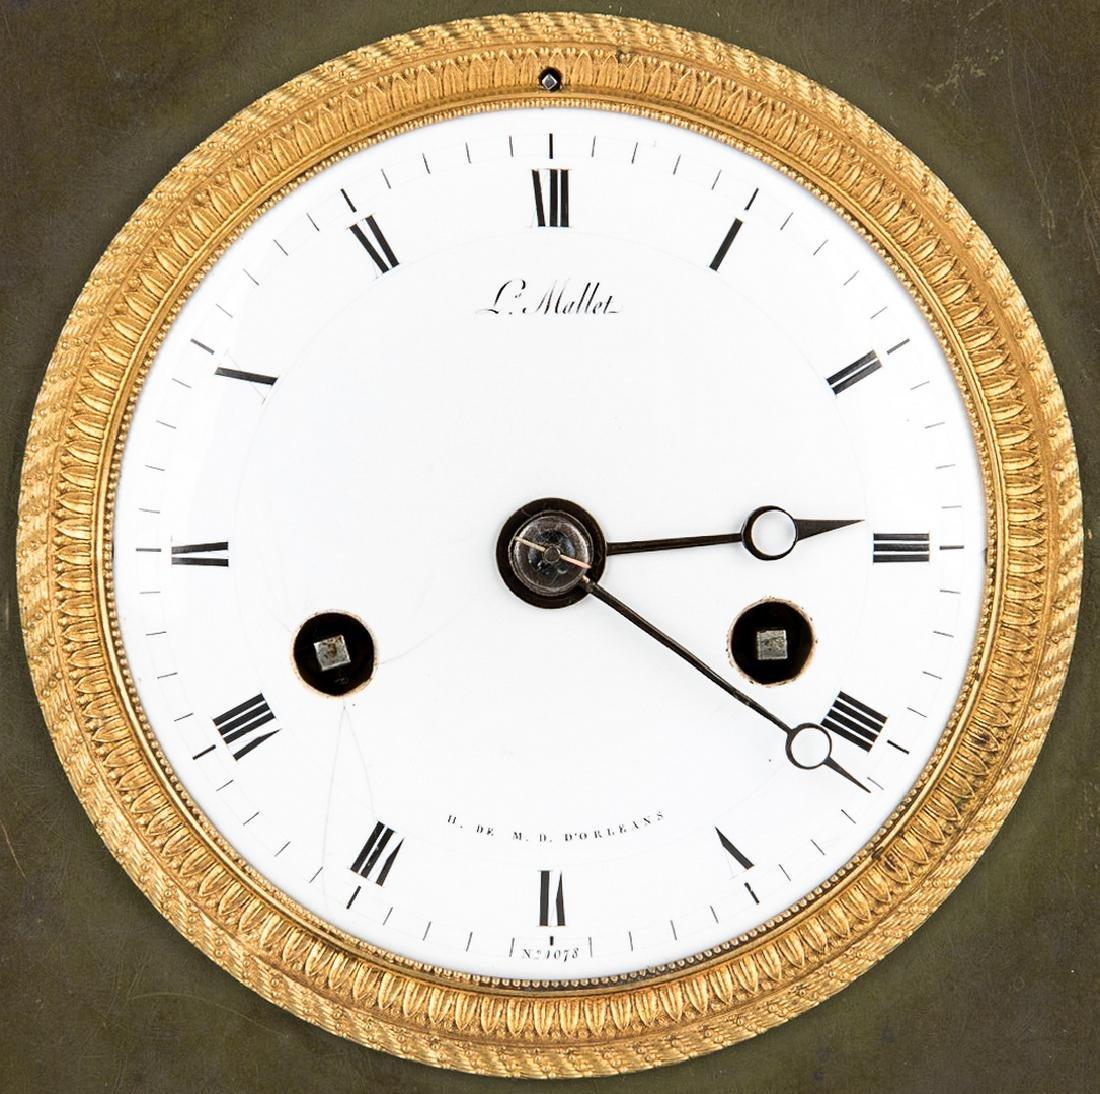 George Washington Clock by Mallet, c. 1820 - 10